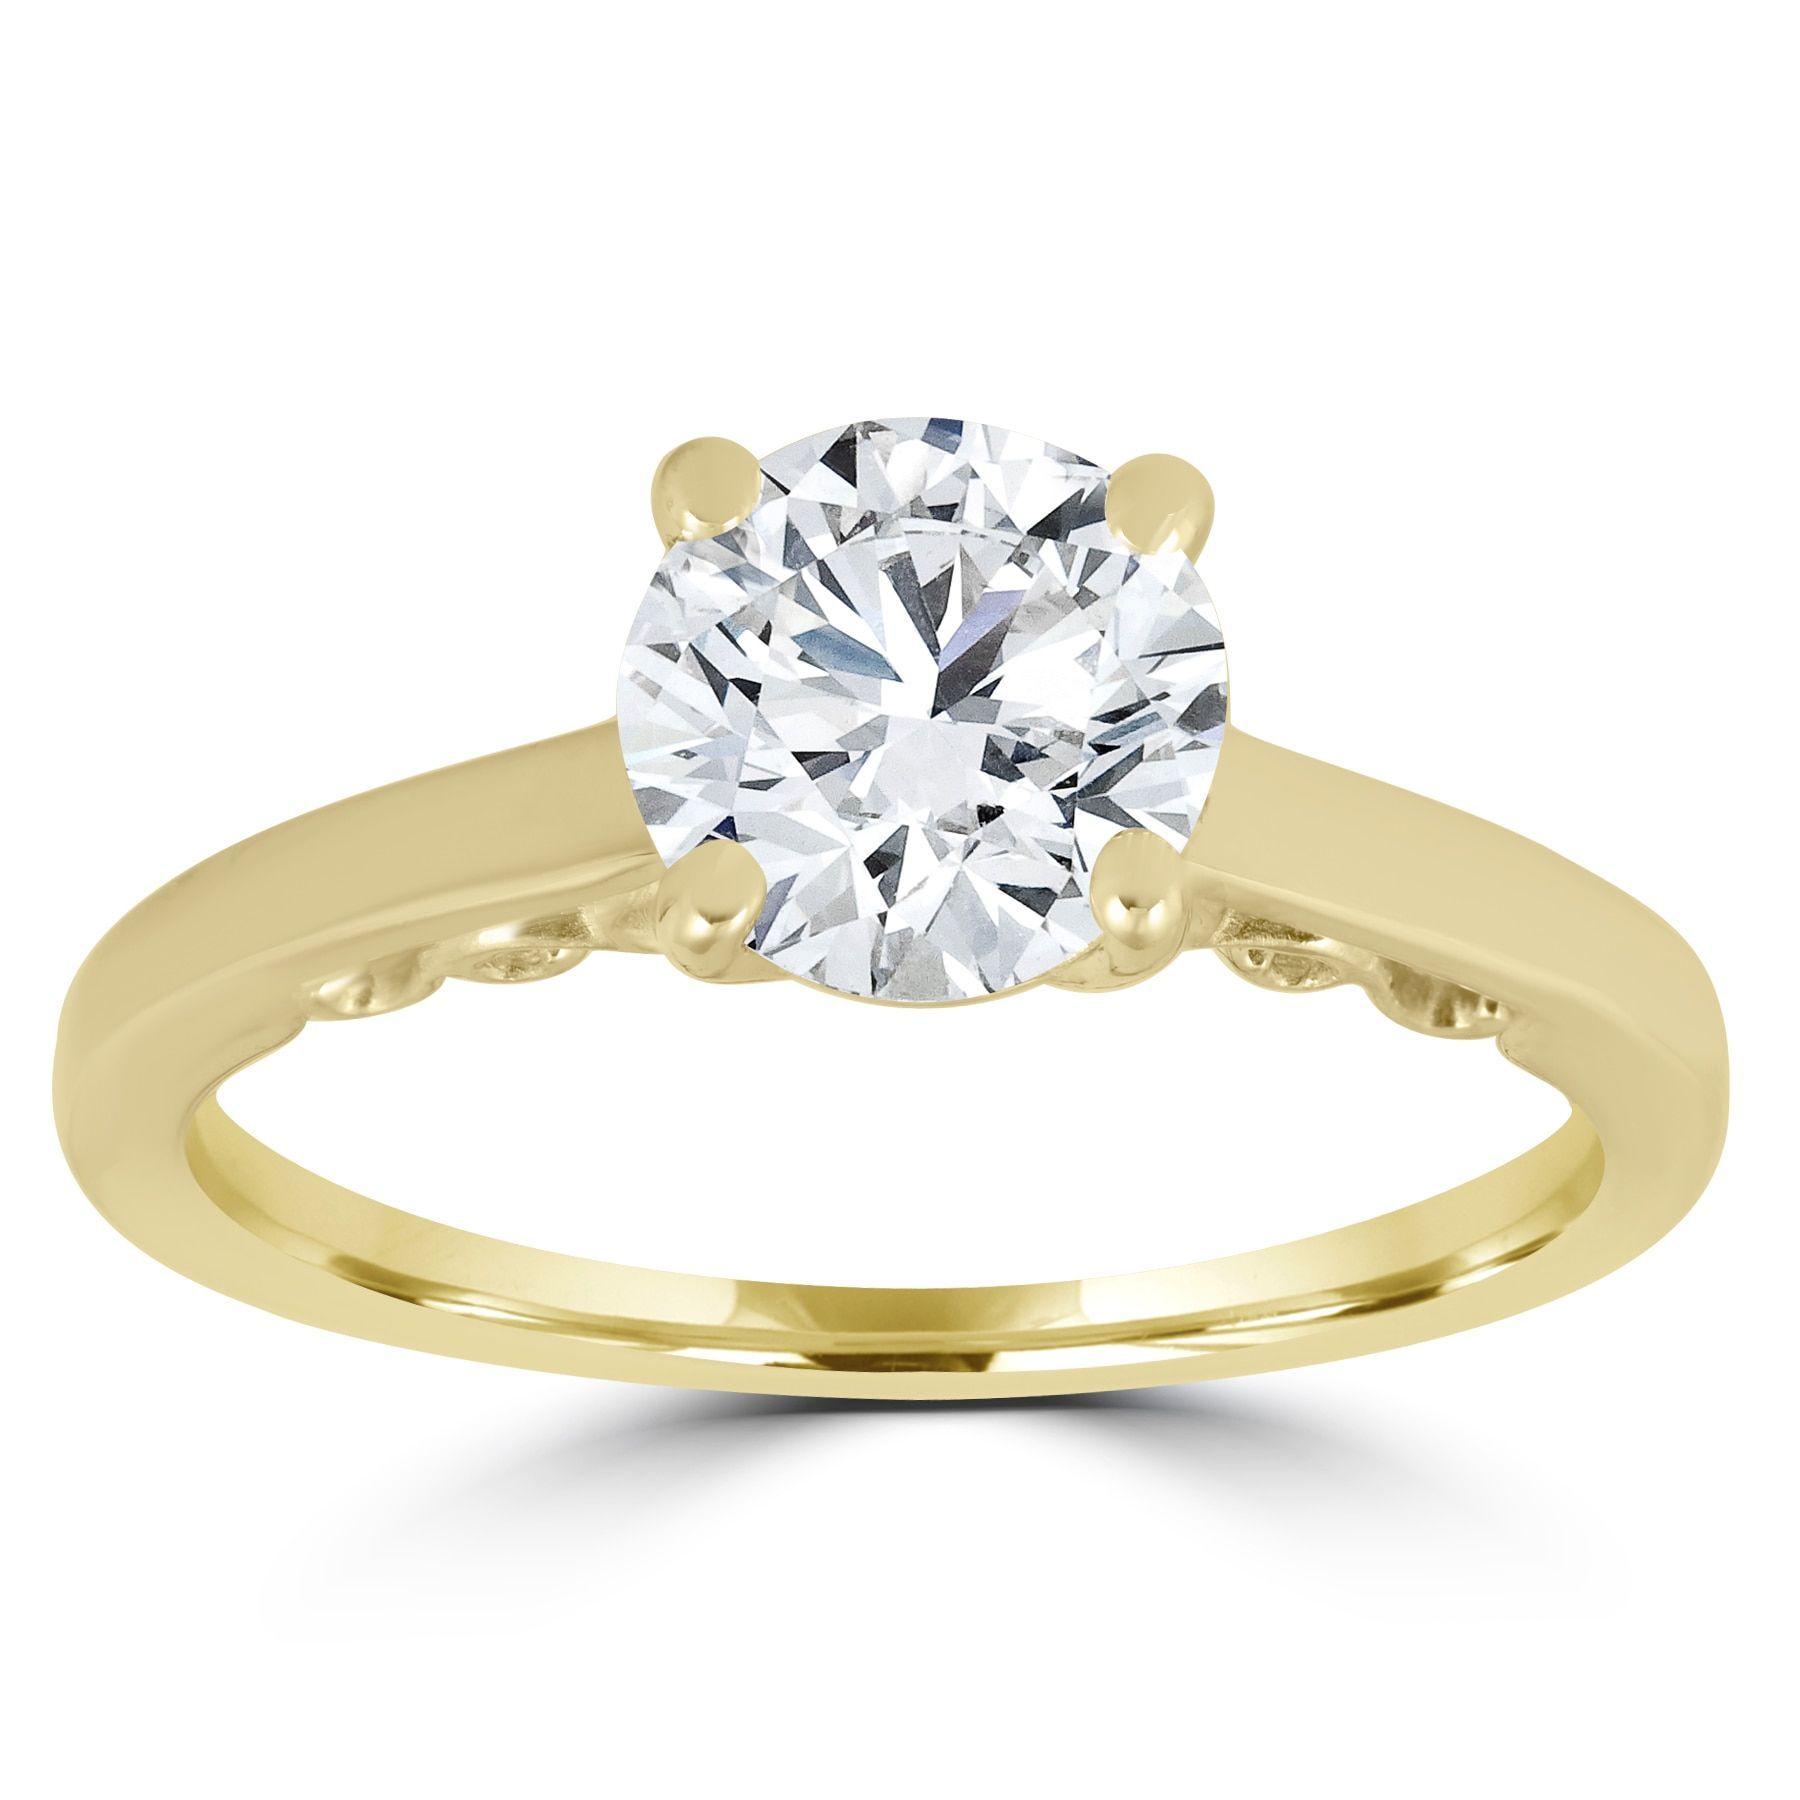 bliss 14k yellow gold 1 ct tdw diamond clarity enhanced round